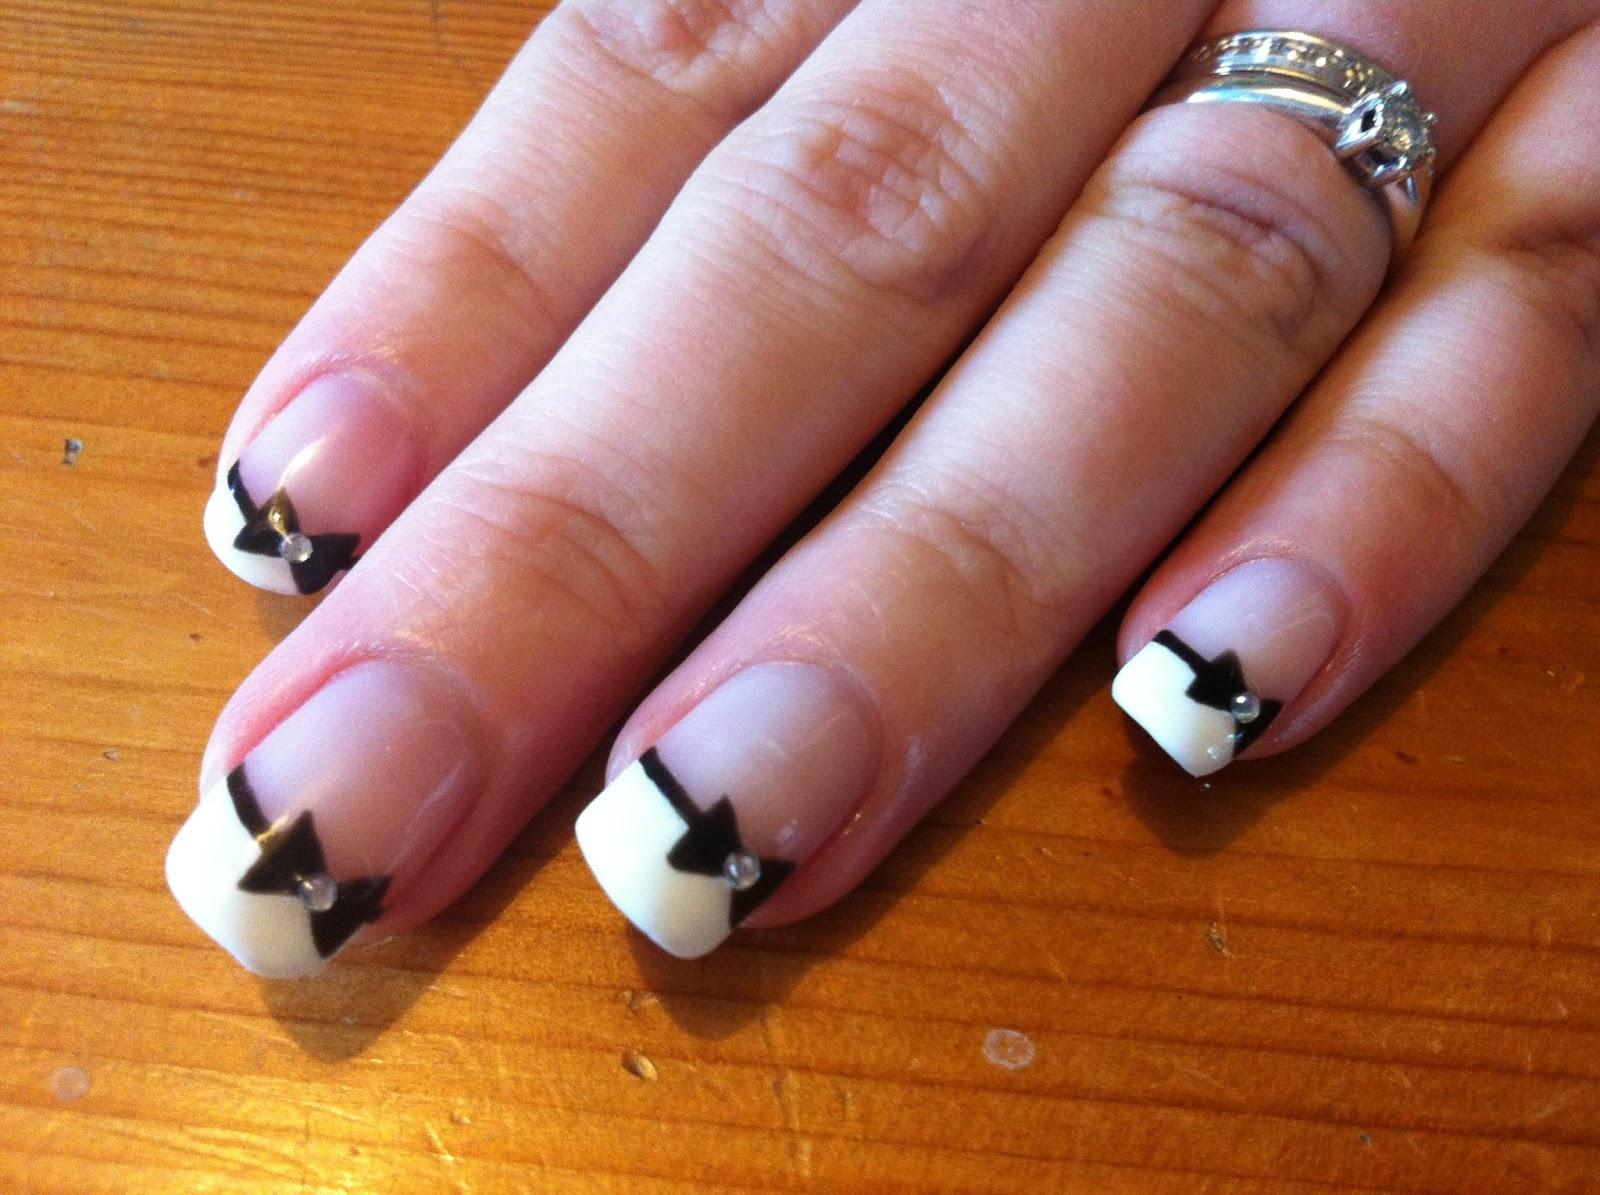 Brush up and Polish up! CND Shellac Nail Art French